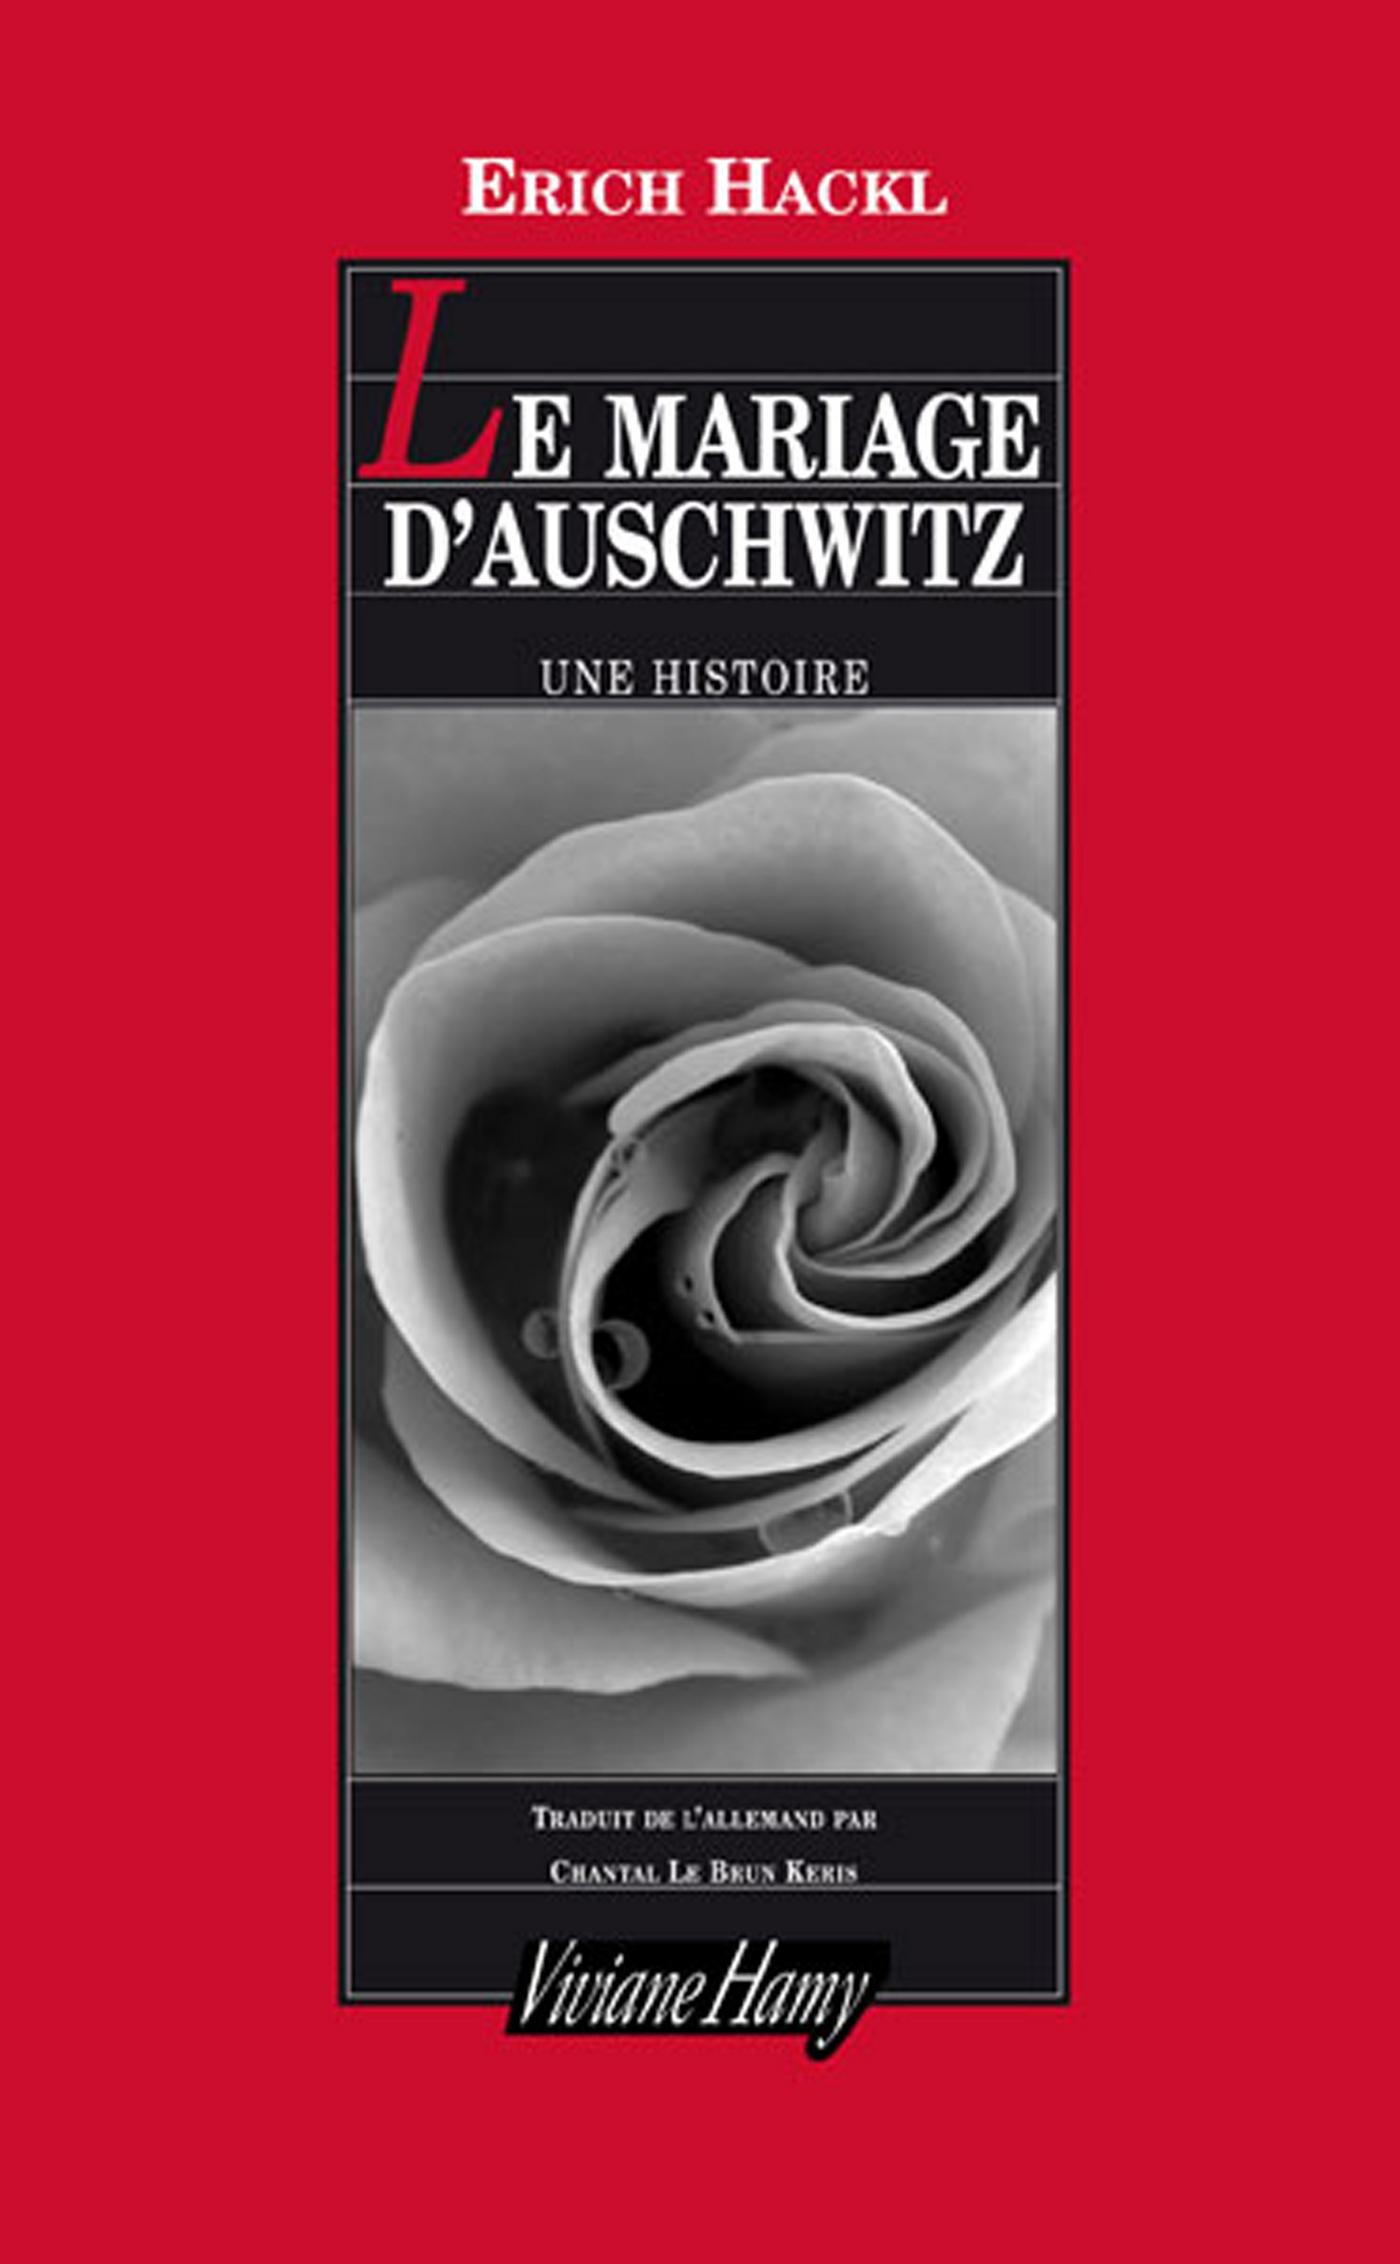 Le Mariage d'Auschwitz